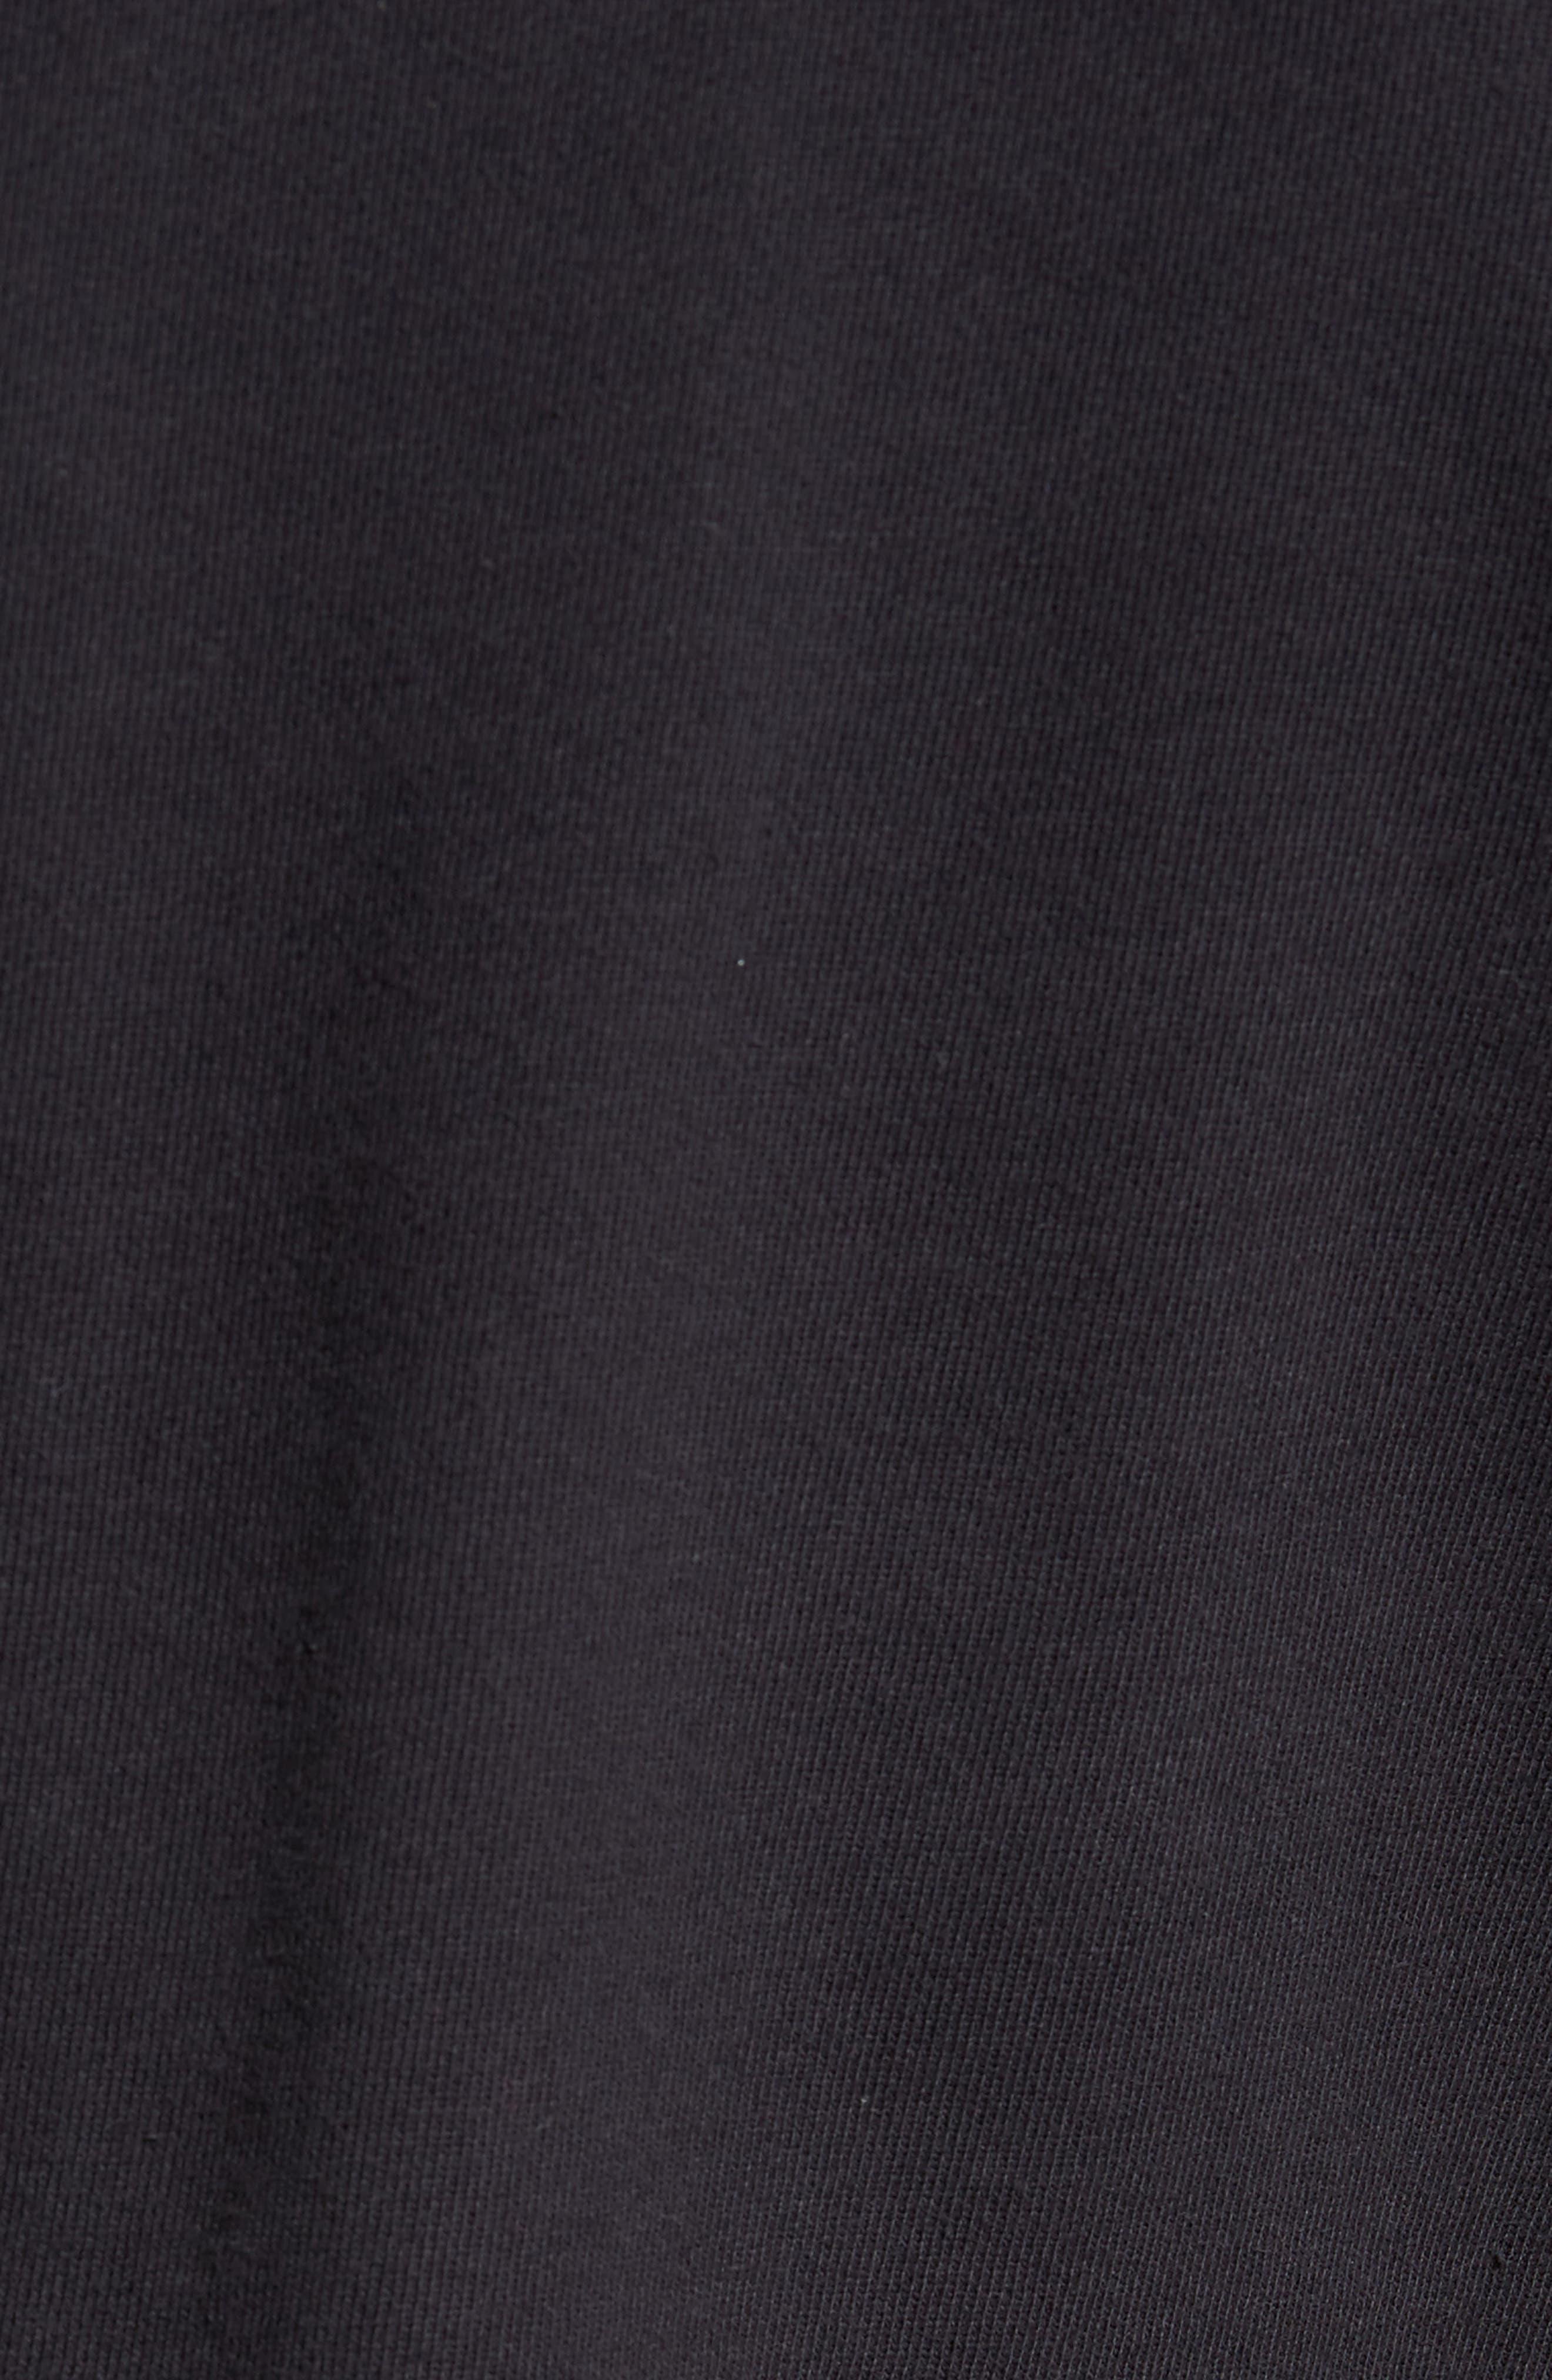 Distressed Sweatshirt,                             Alternate thumbnail 5, color,                             001